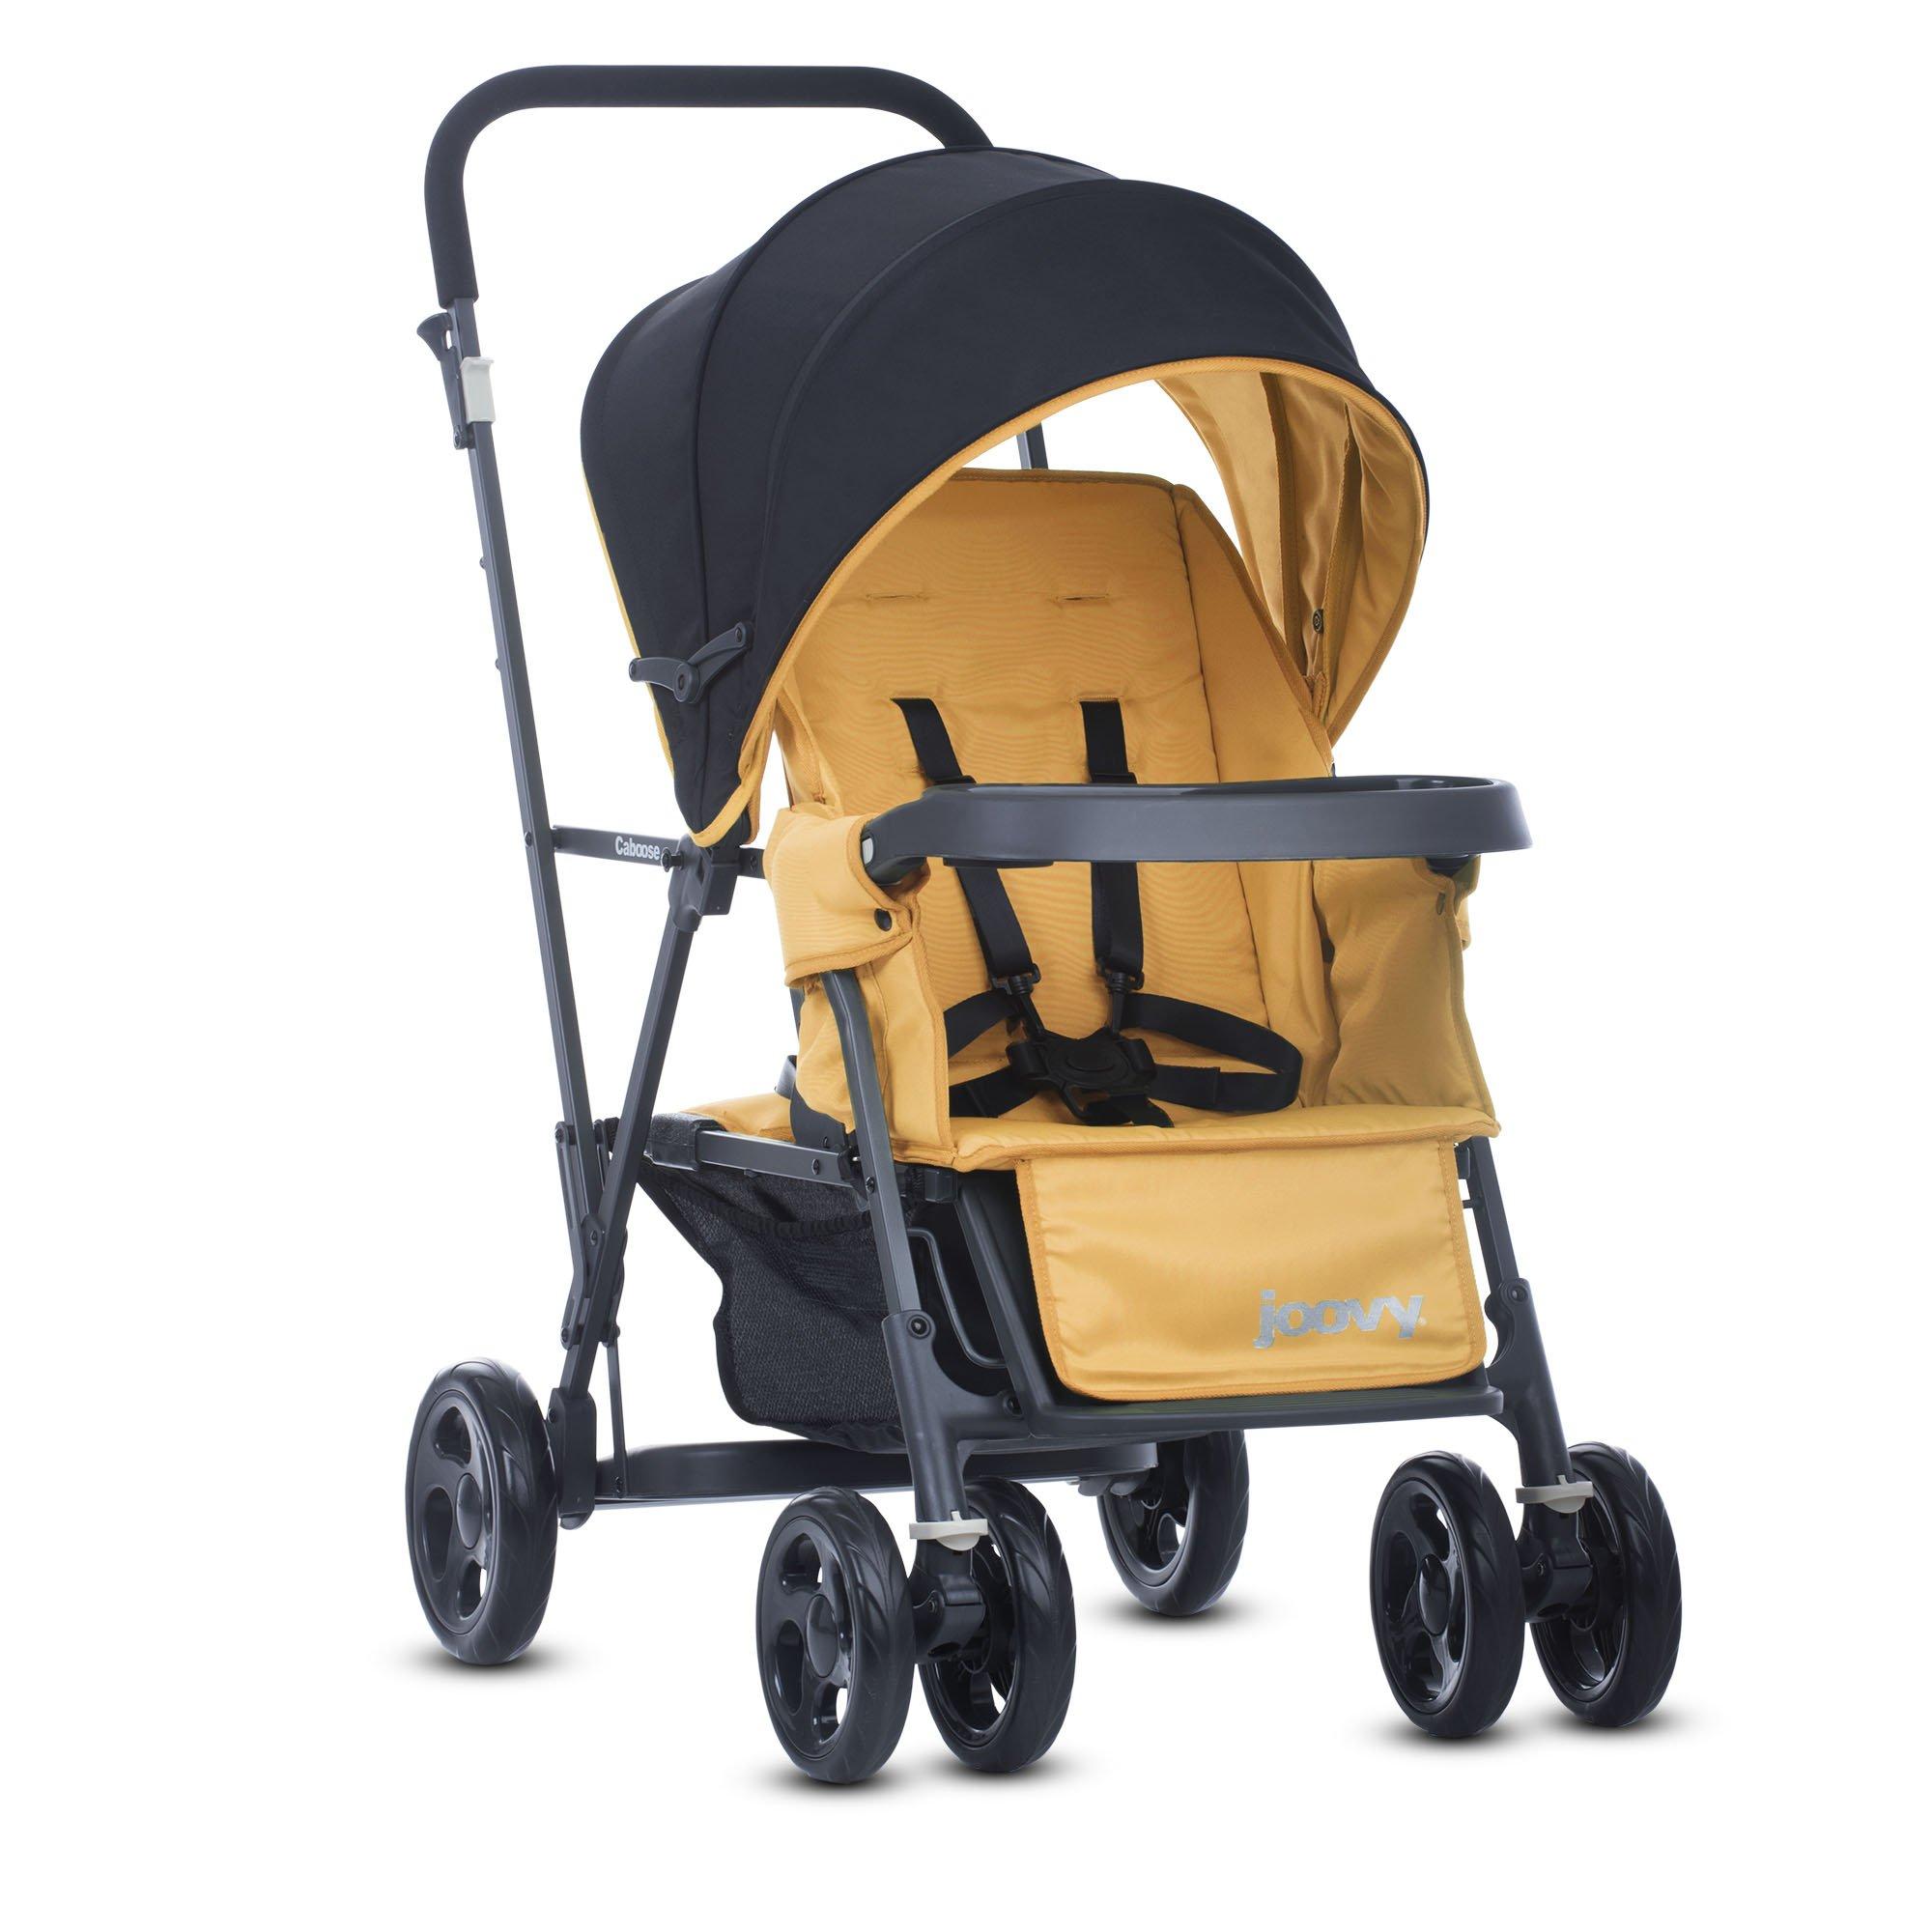 Joovy Caboose Graphite Stand On Tandem Stroller, Amber